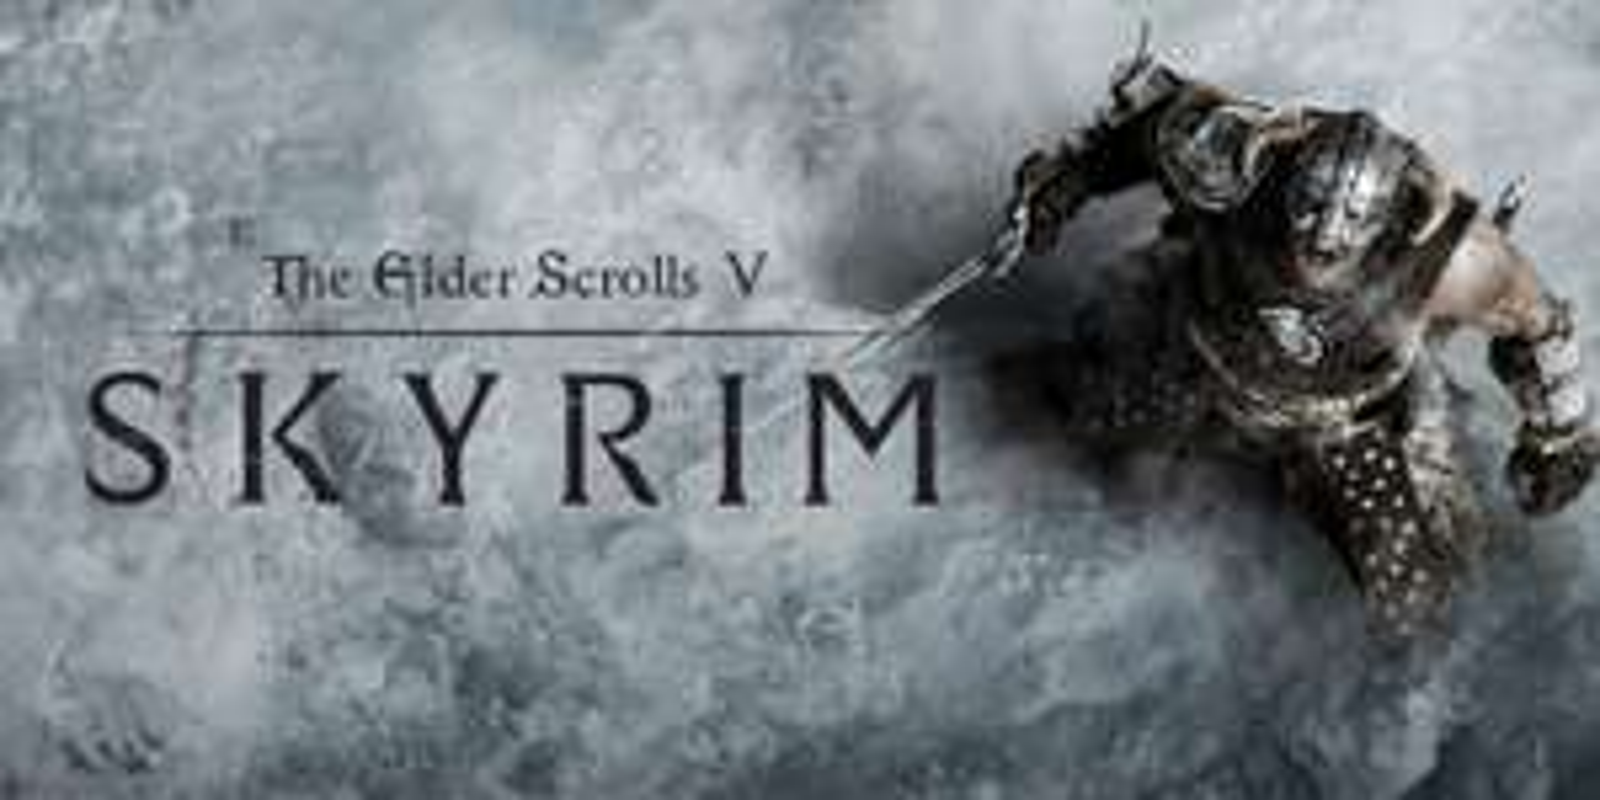 The Elder Scrolls V Skyrim - Switch - £24.99 @ Nintendo eShop